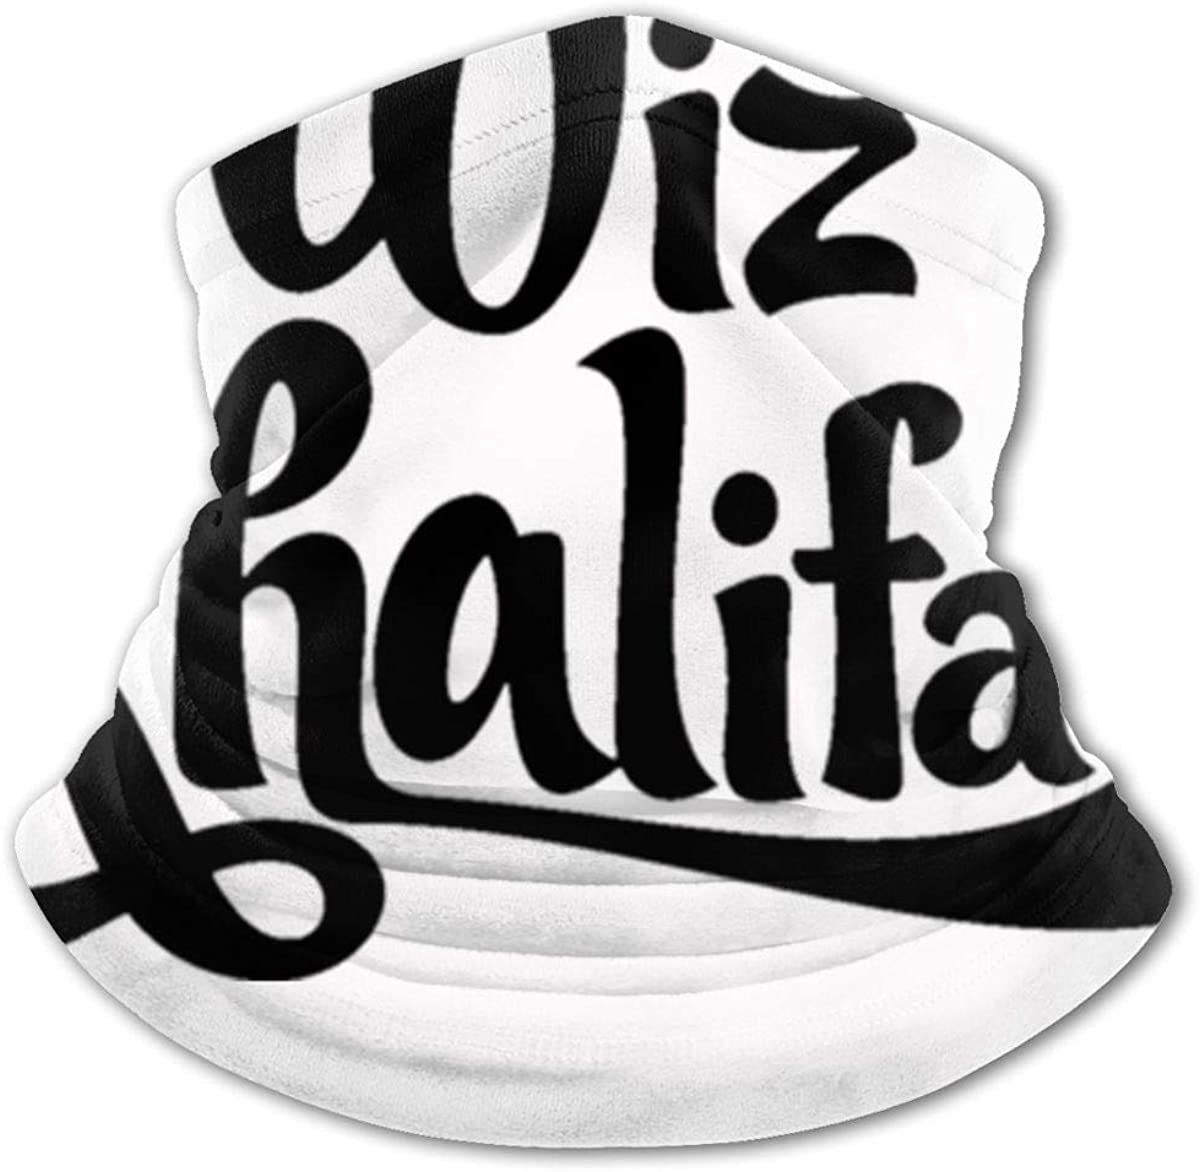 Cooling Neck Gaiters Face Cover for Boys Girls Outdoor - Scarf Wiz Khalifa Bandana Black